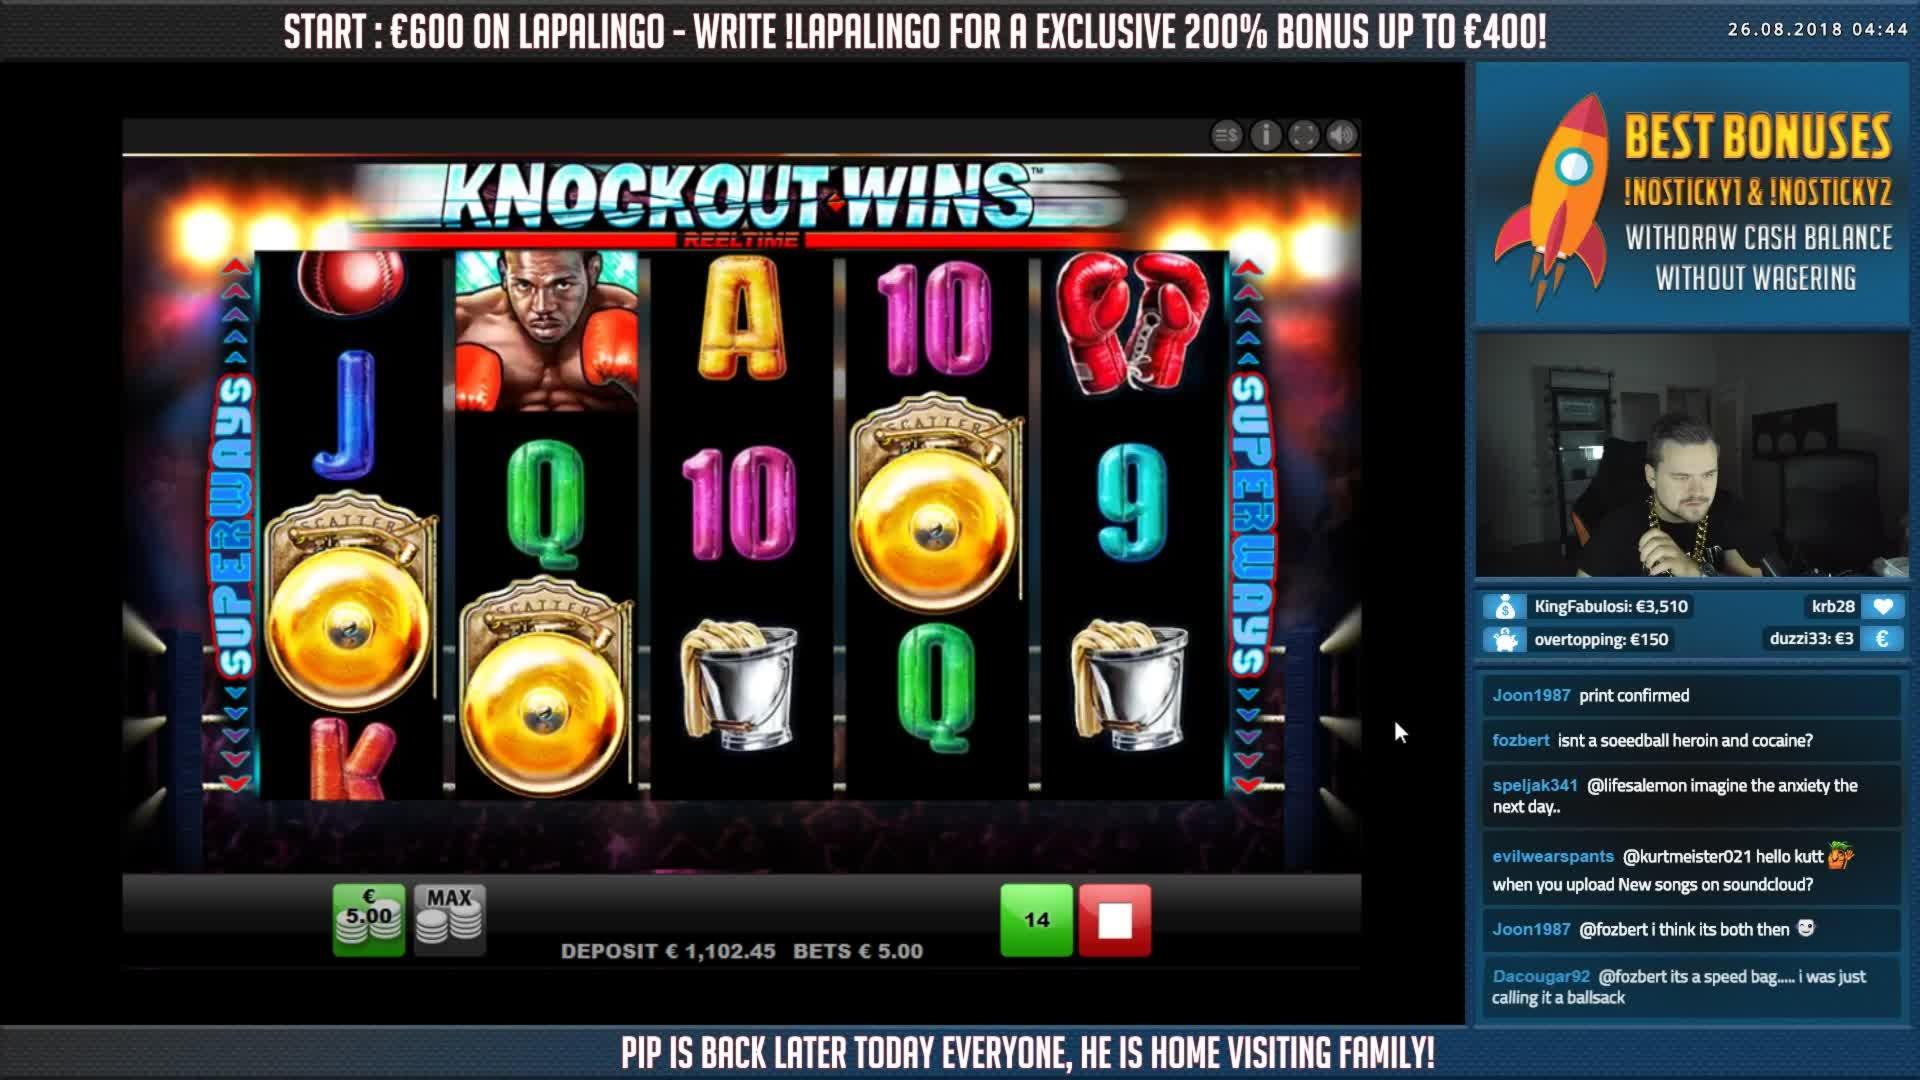 €980 Daily freeroll slot tournament at Karamba Casino